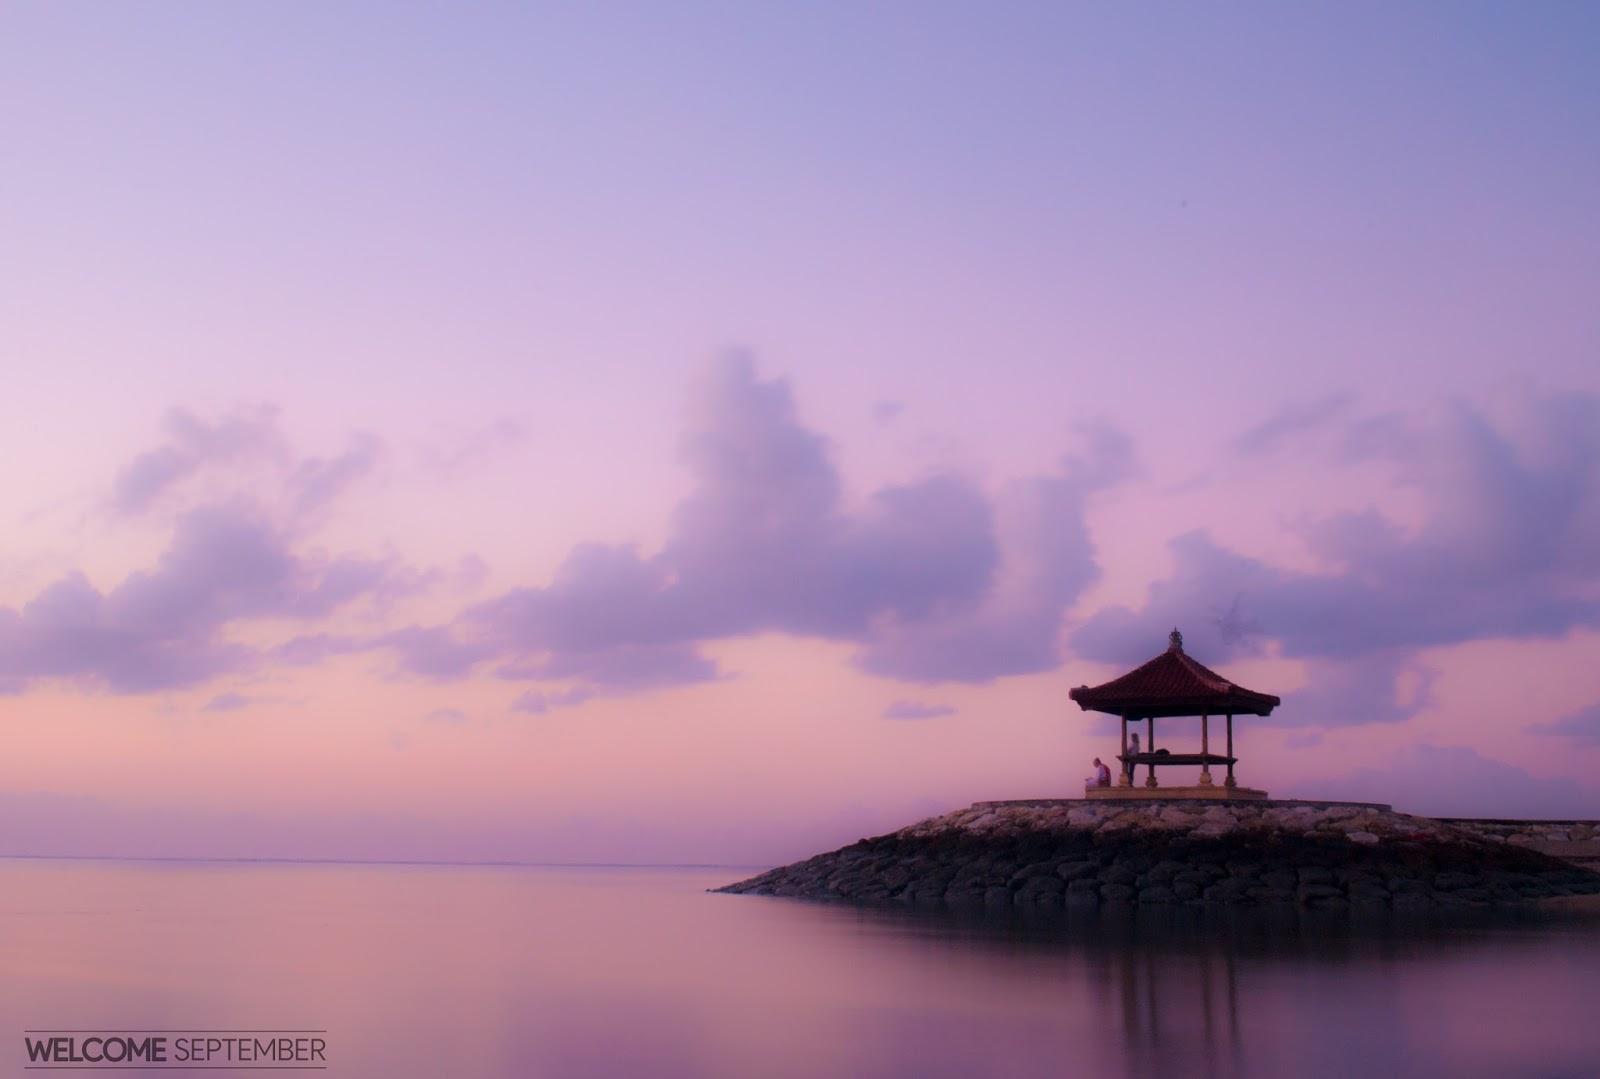 S1 Industri Perjalanan Wisata Destinasi Wisata Pantai Karang